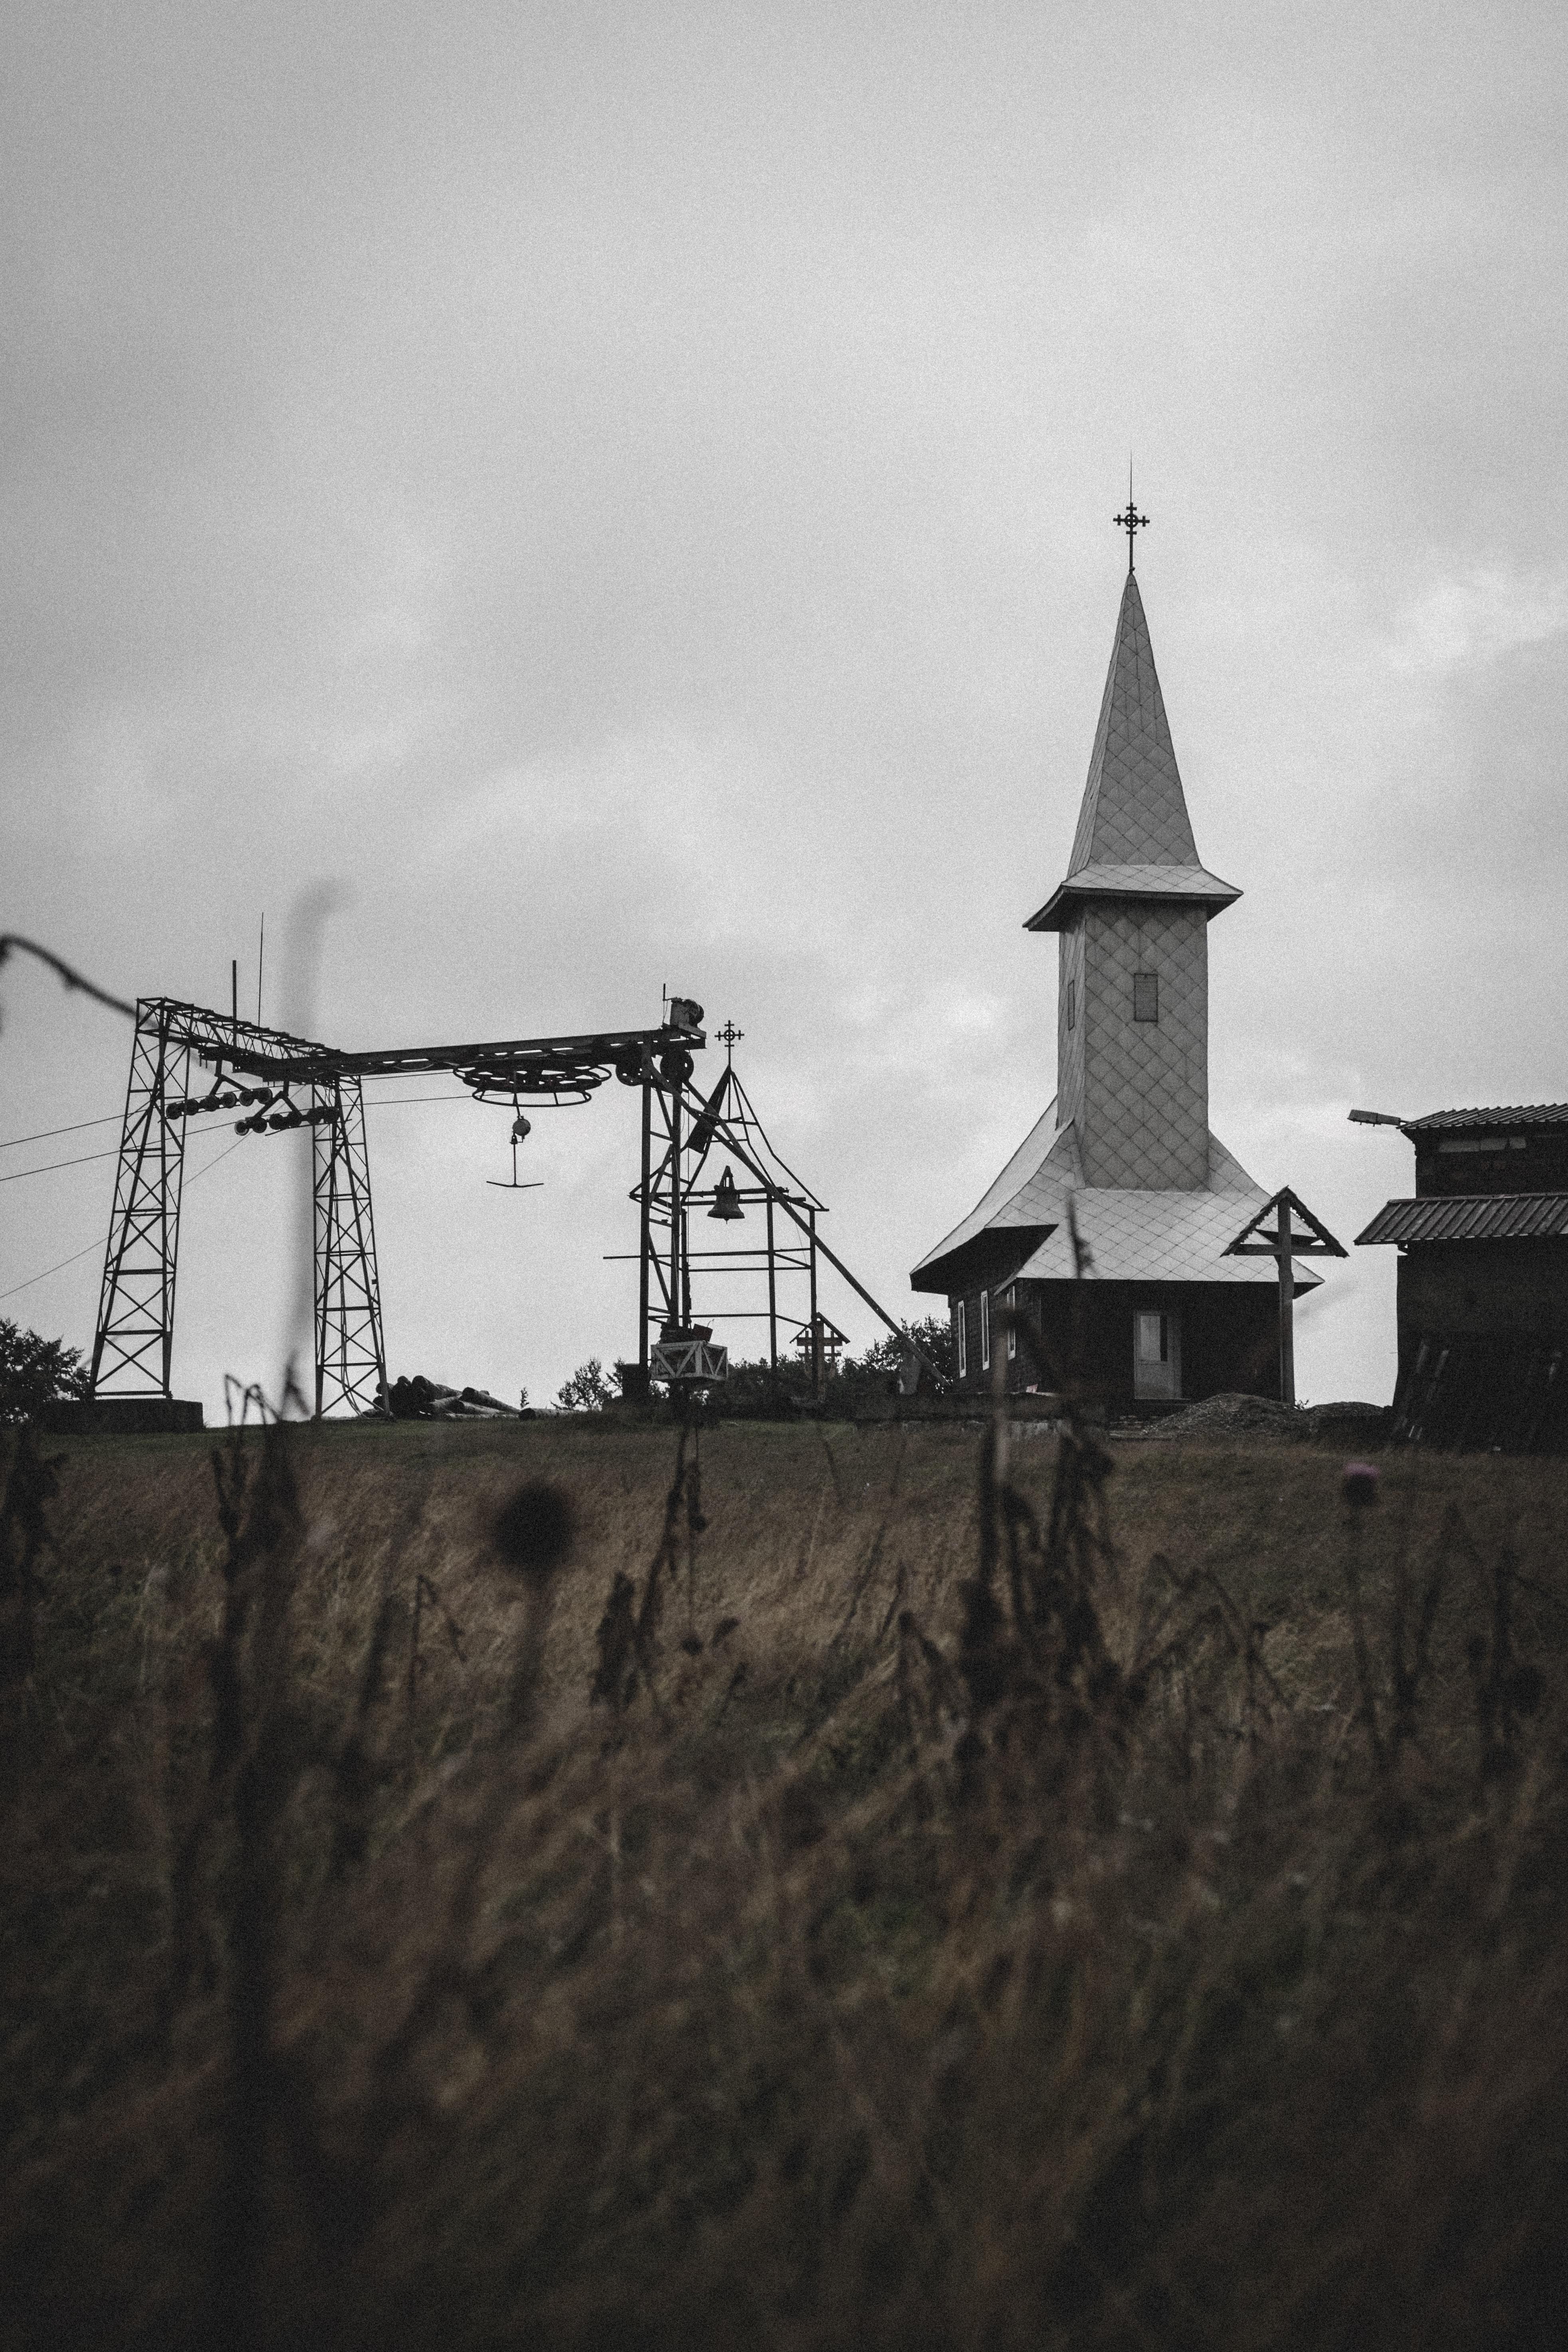 gray chapel on grass field